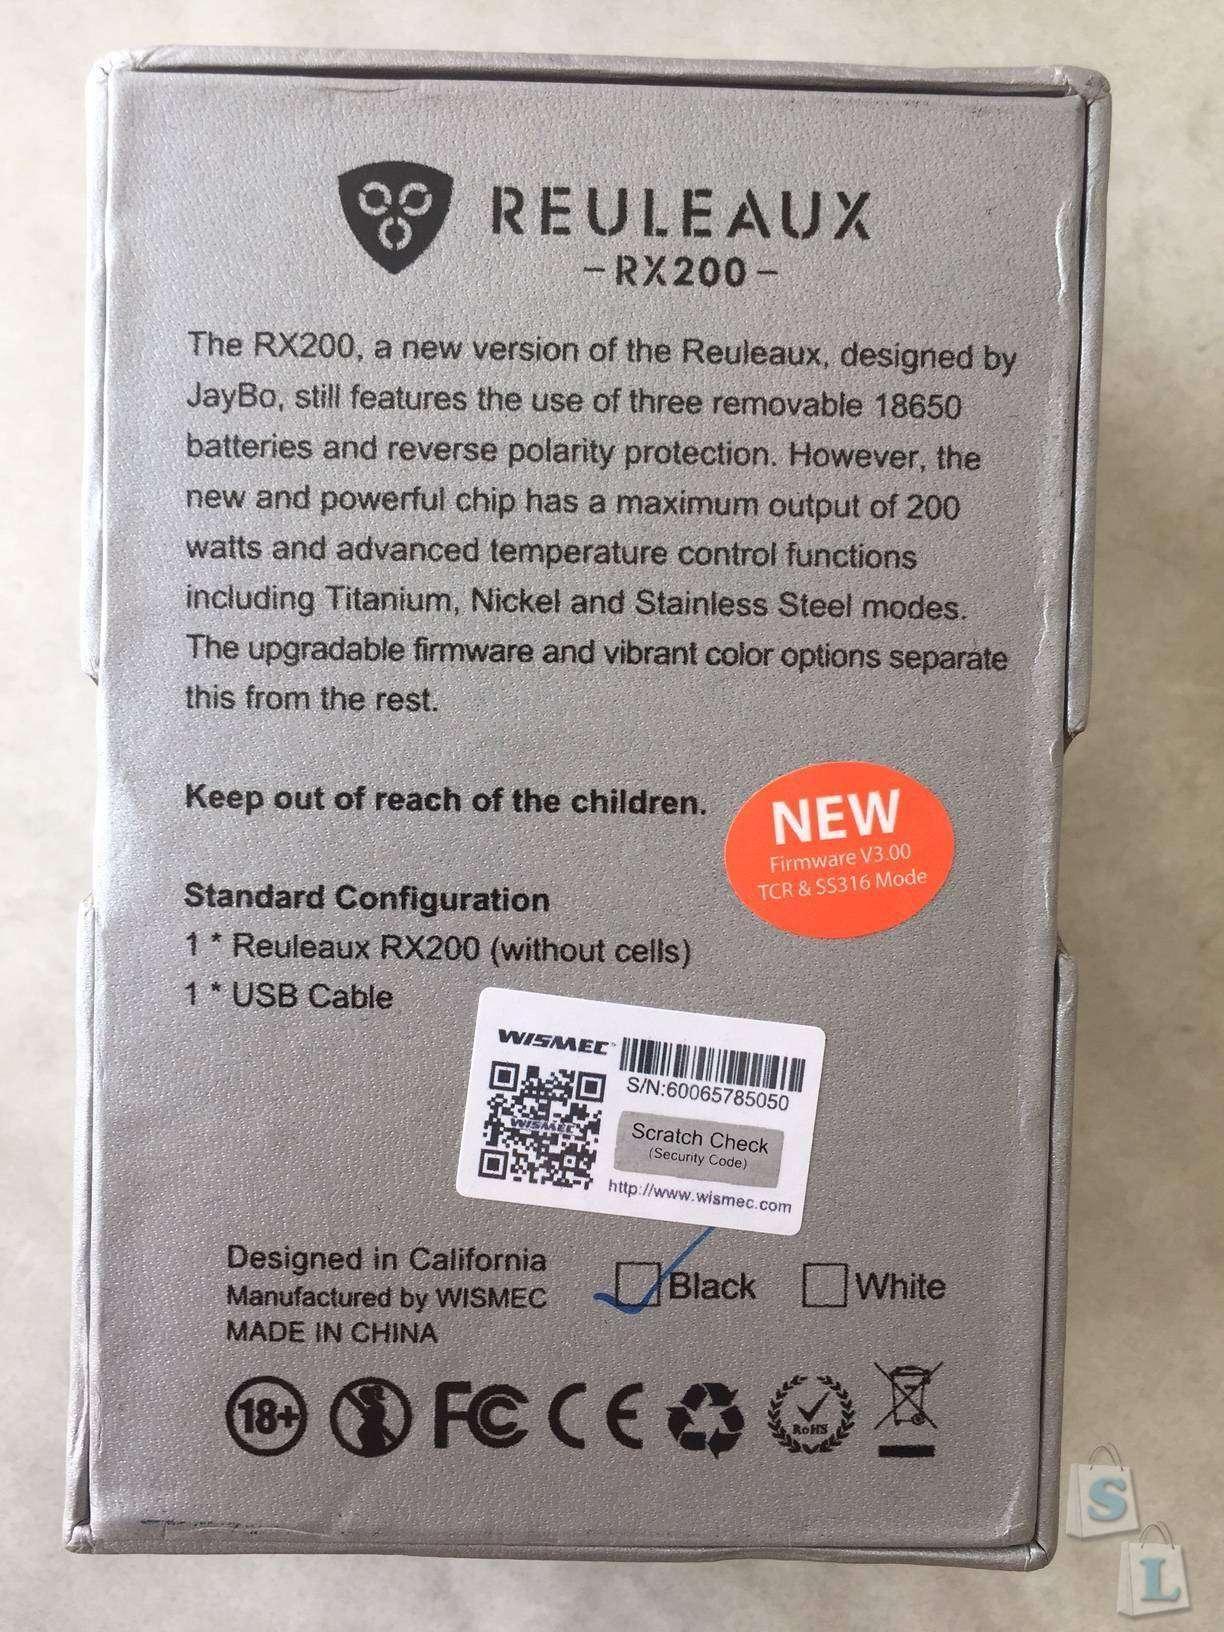 GearBest: Боксмод WISMEC Reuleaux RX200 TC 200W -  монстр за копейки.